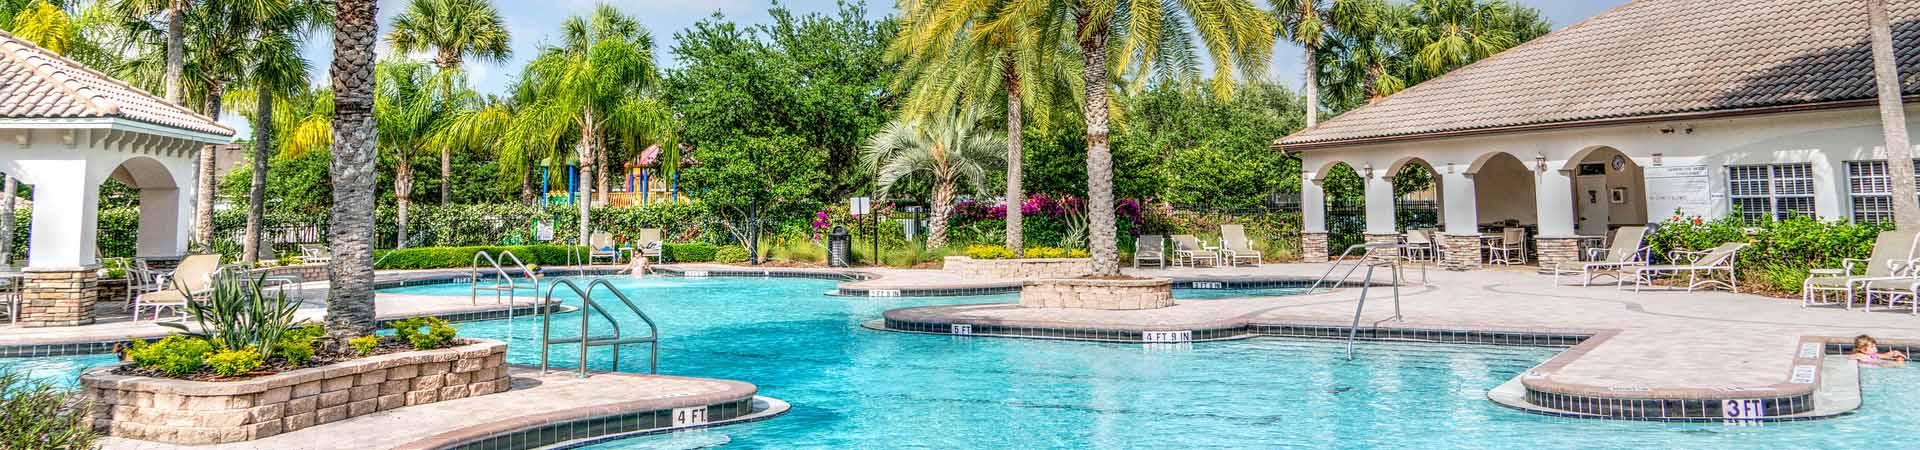 Naples Residential Pool Services   Stahlman Pool Company - Naples, Florida